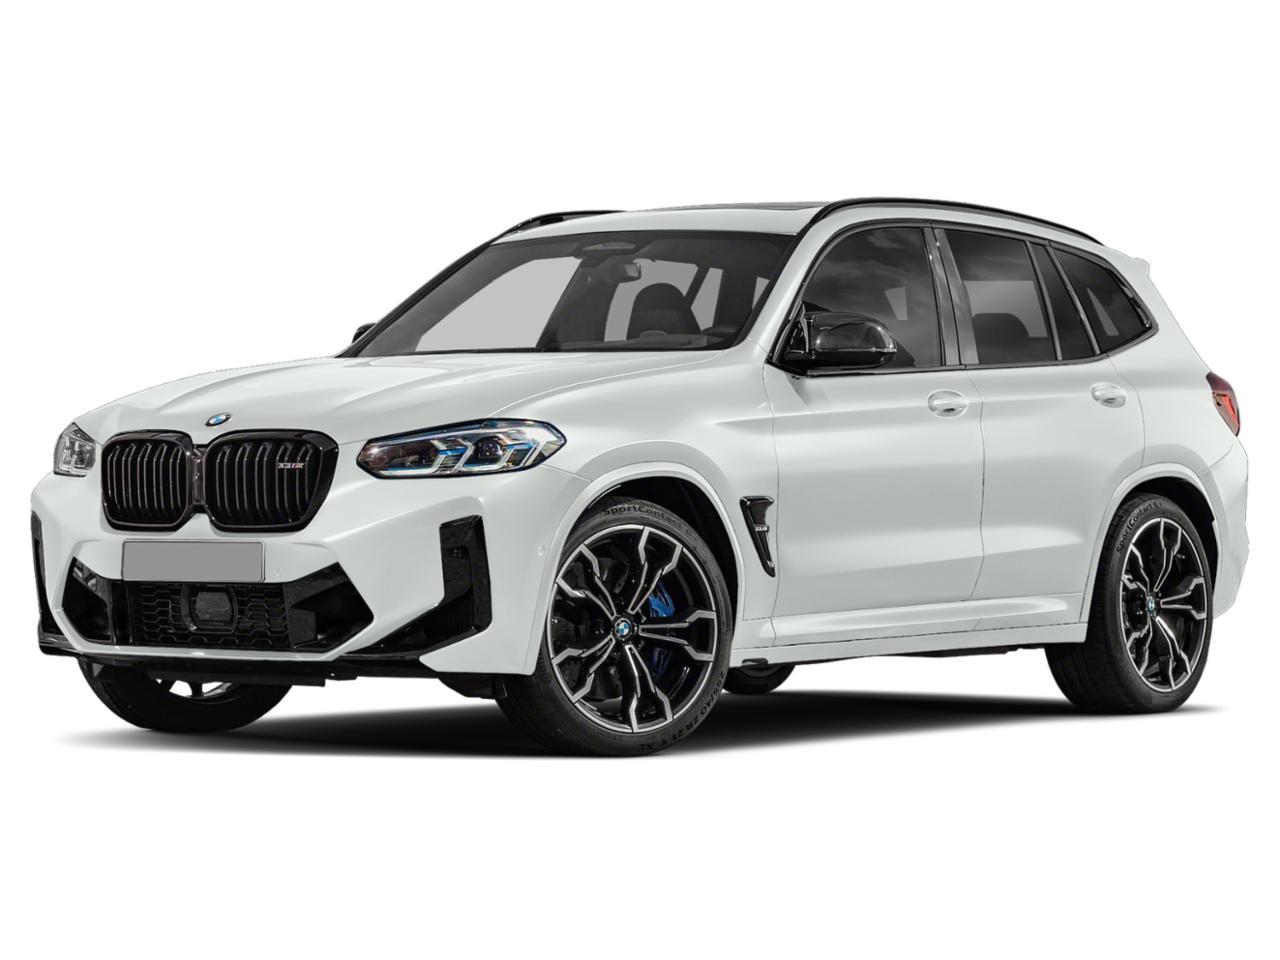 2022 BMW X3 M Vehicle Photo in PLANO, TX 75024-3599